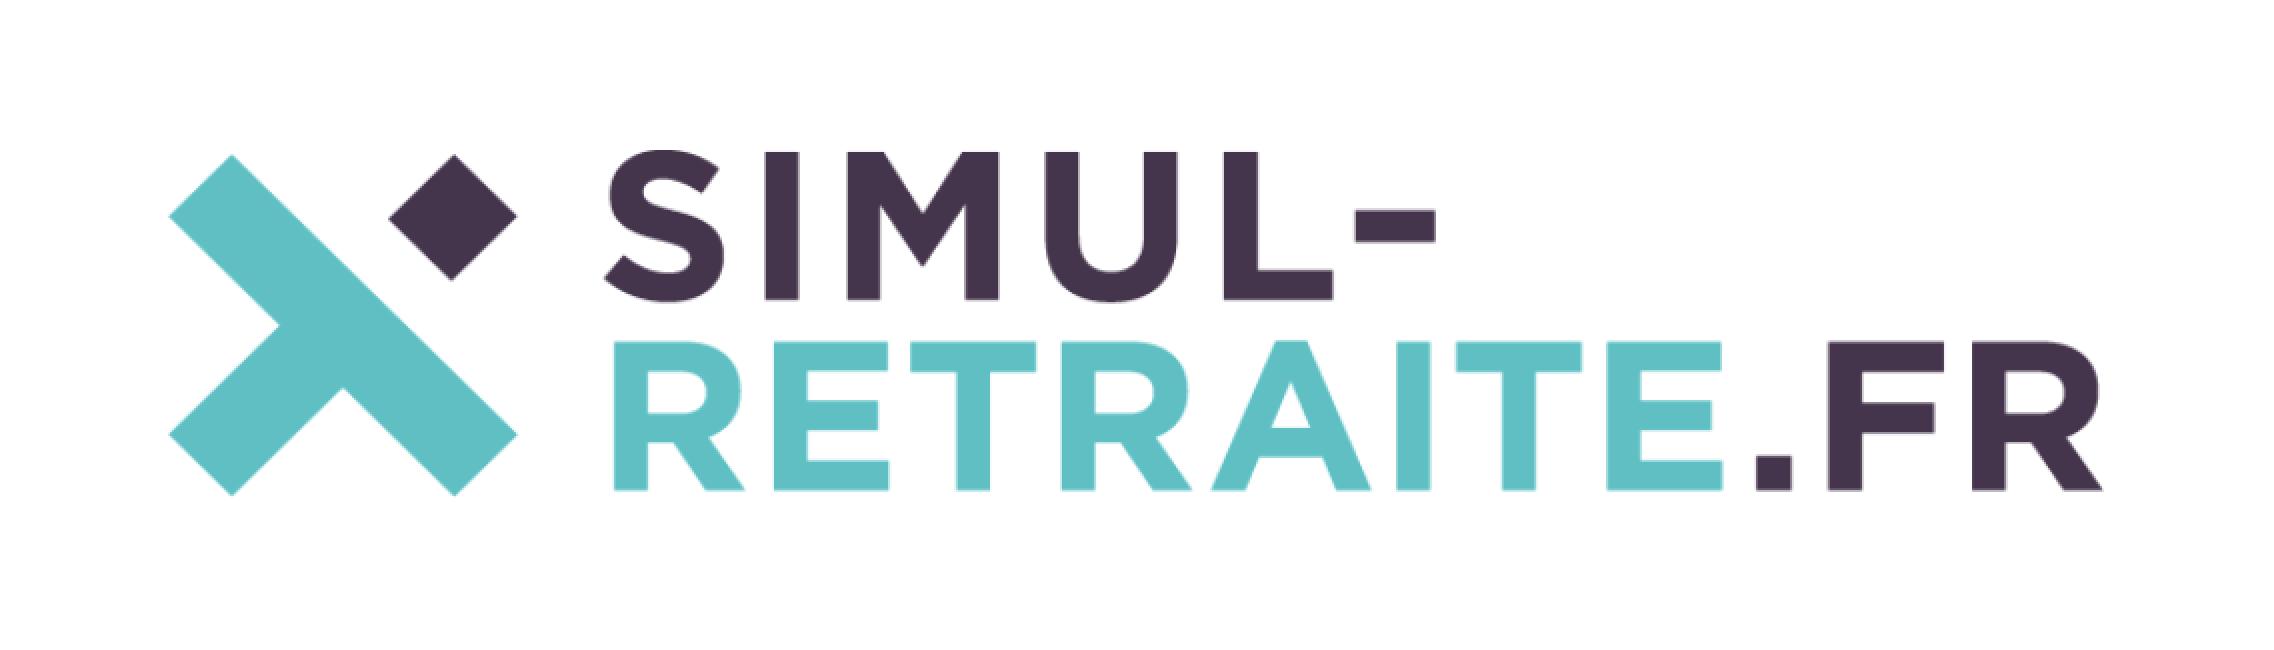 Toutsurlaretraite.com et Simul-retraite.fr